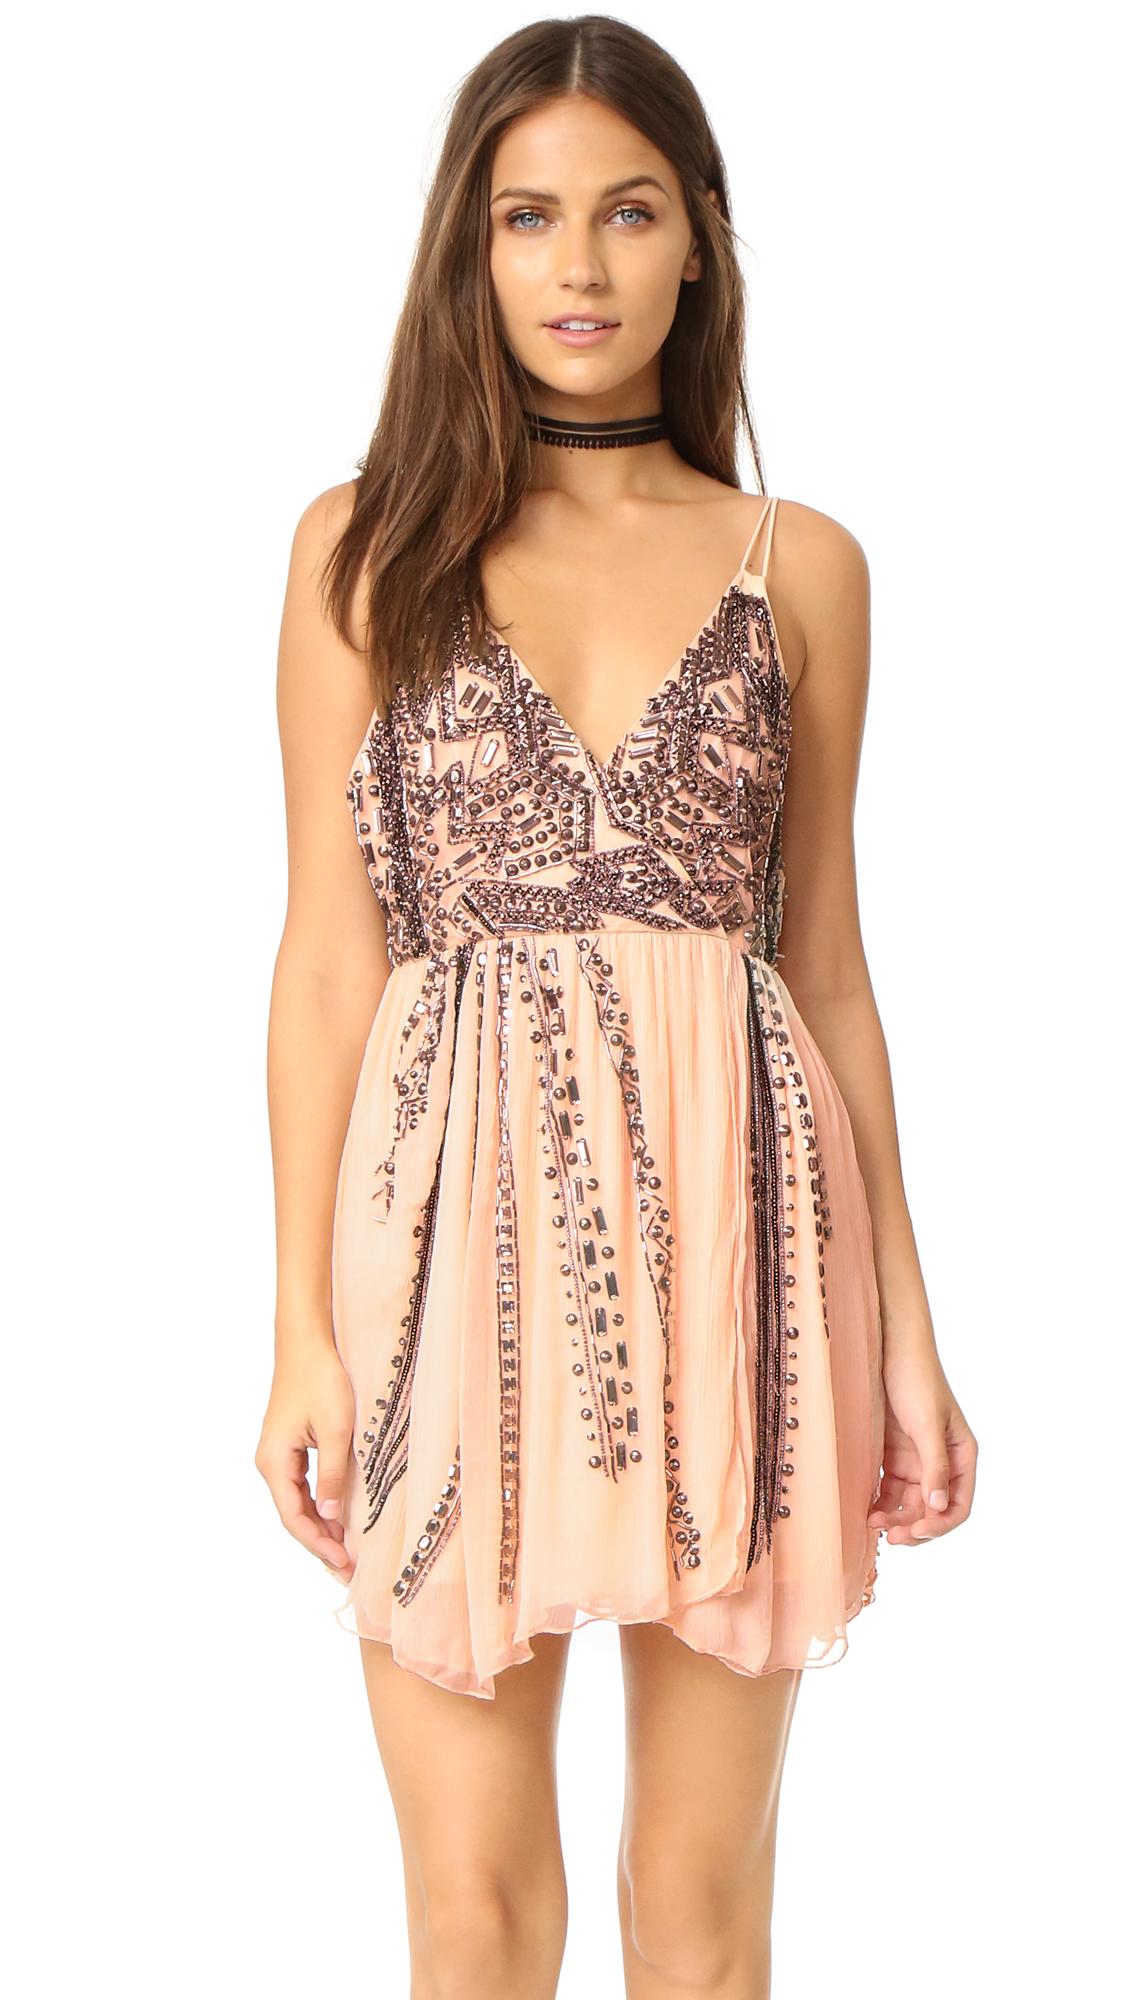 8433e0d2d962e Free People Cassiopeia Embellished Mini Party Dress